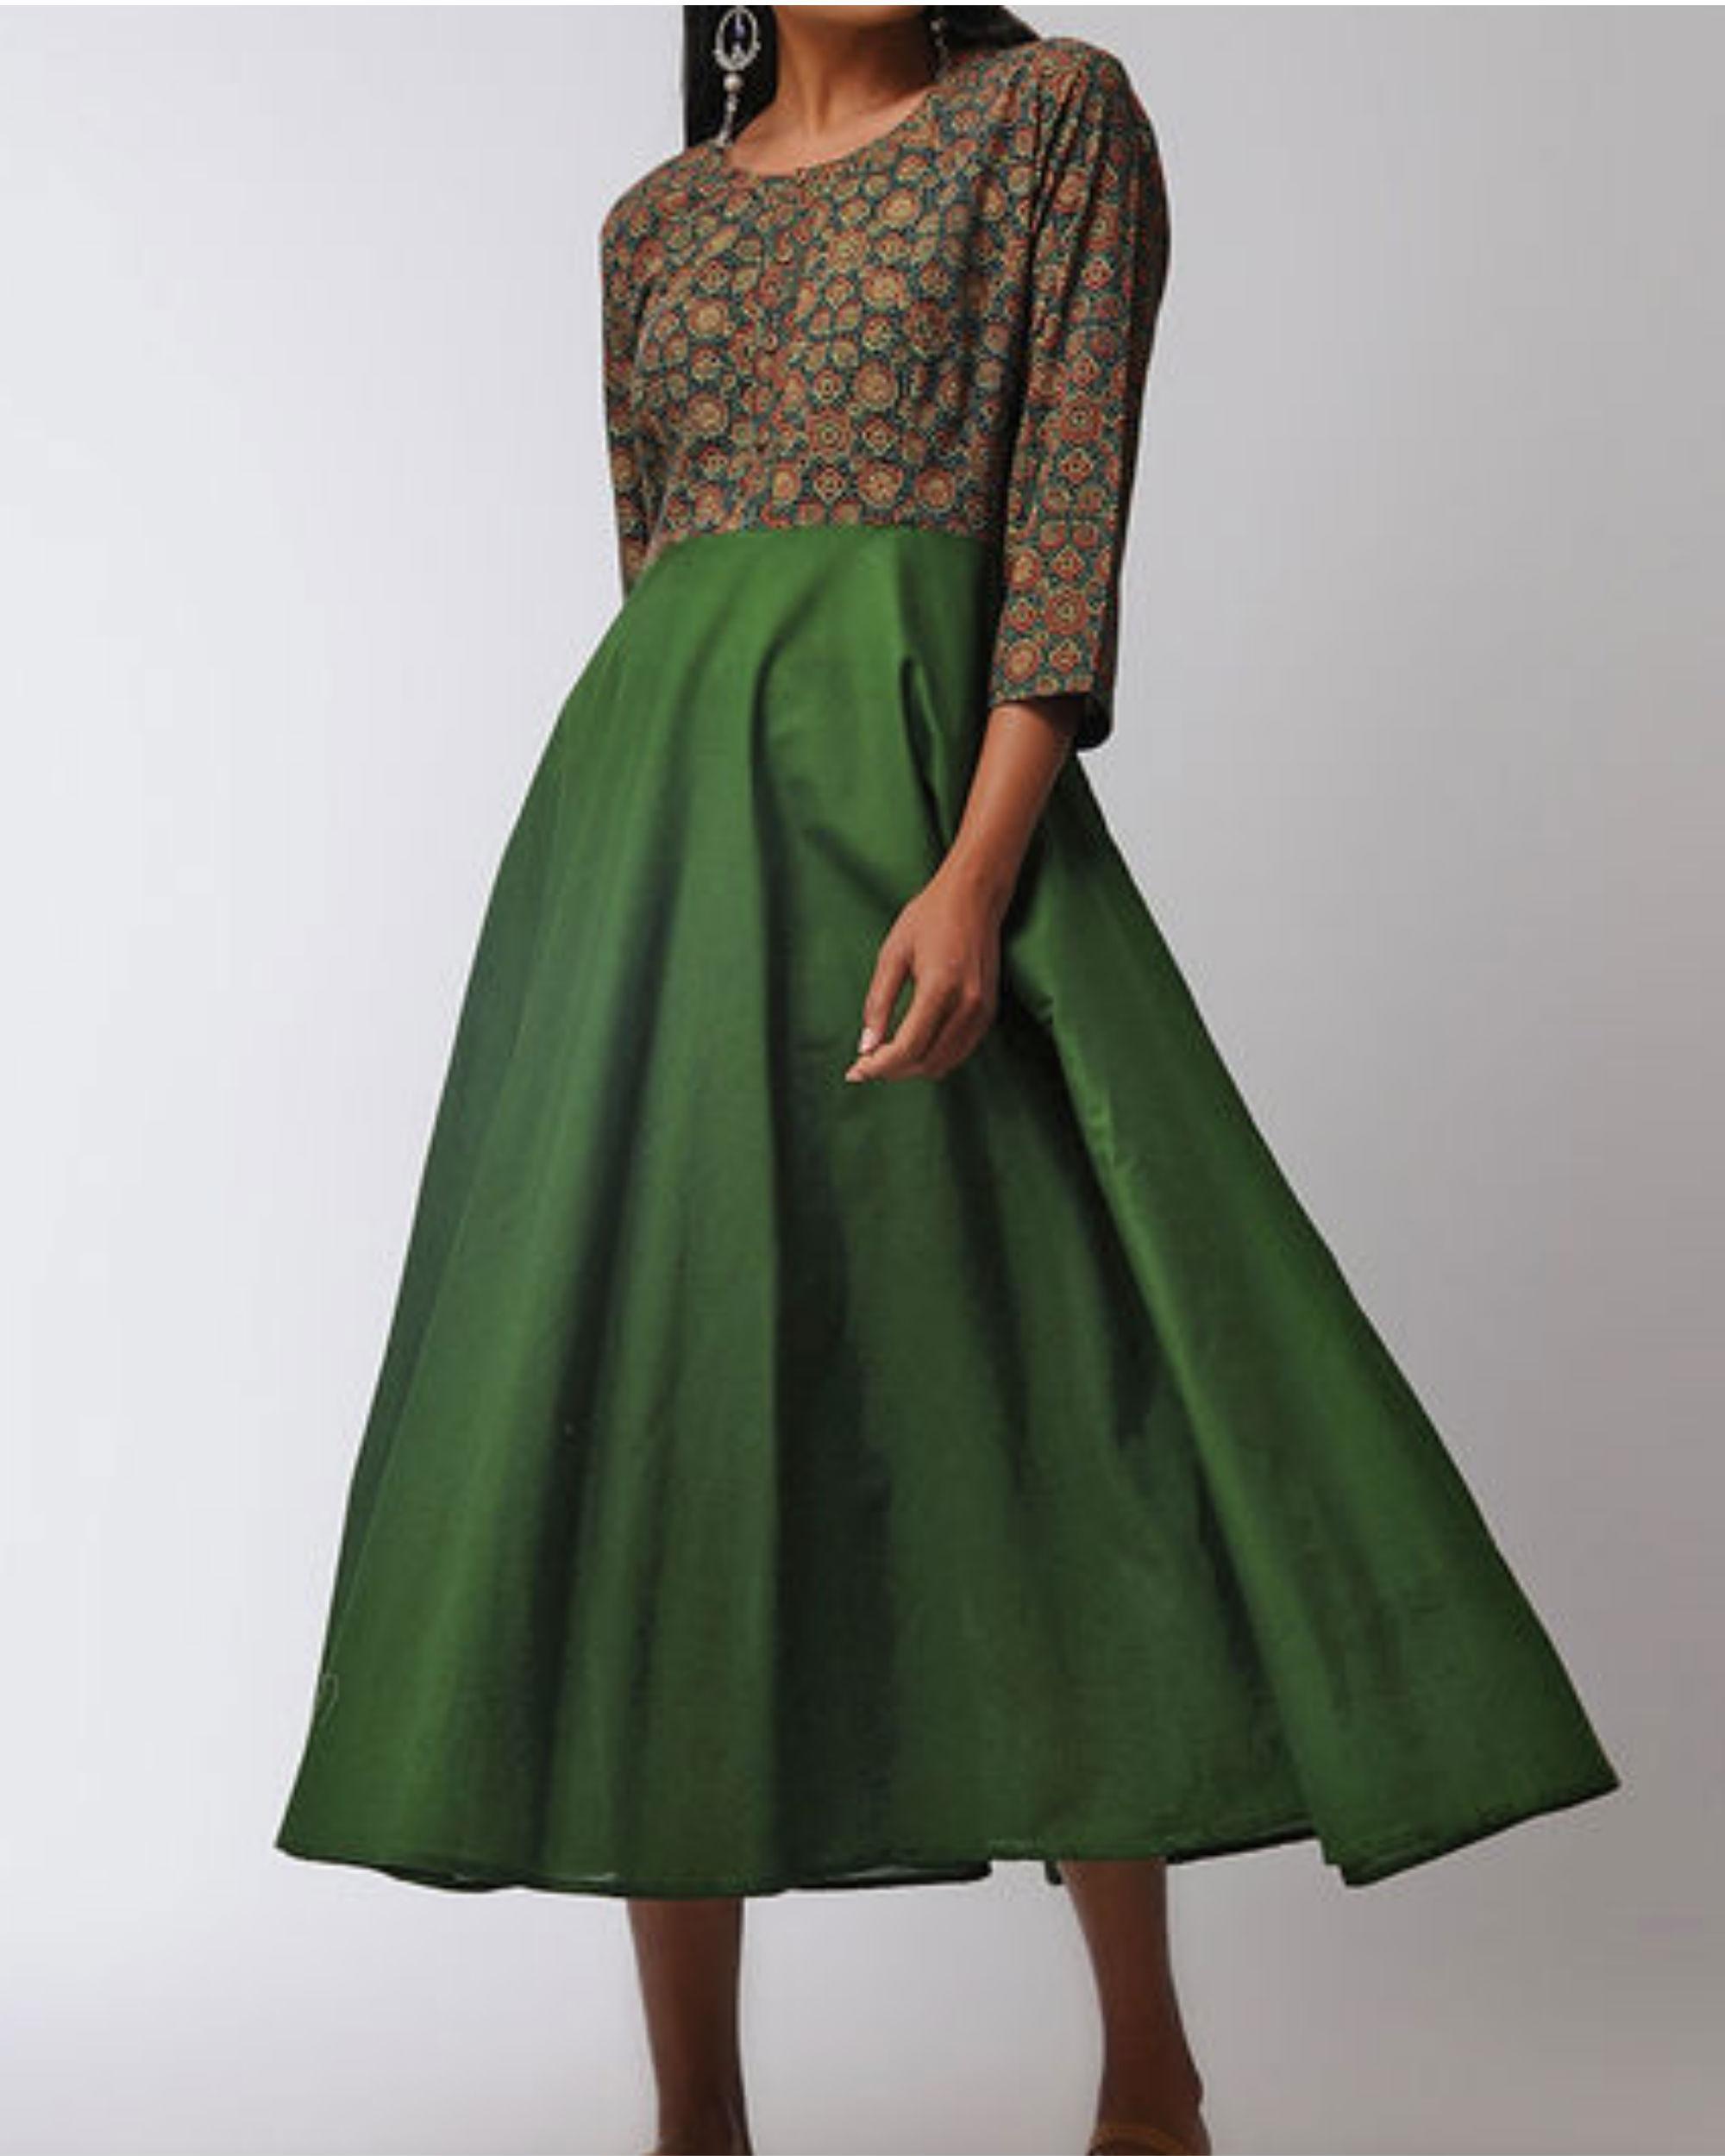 Green ajrakh flared dress